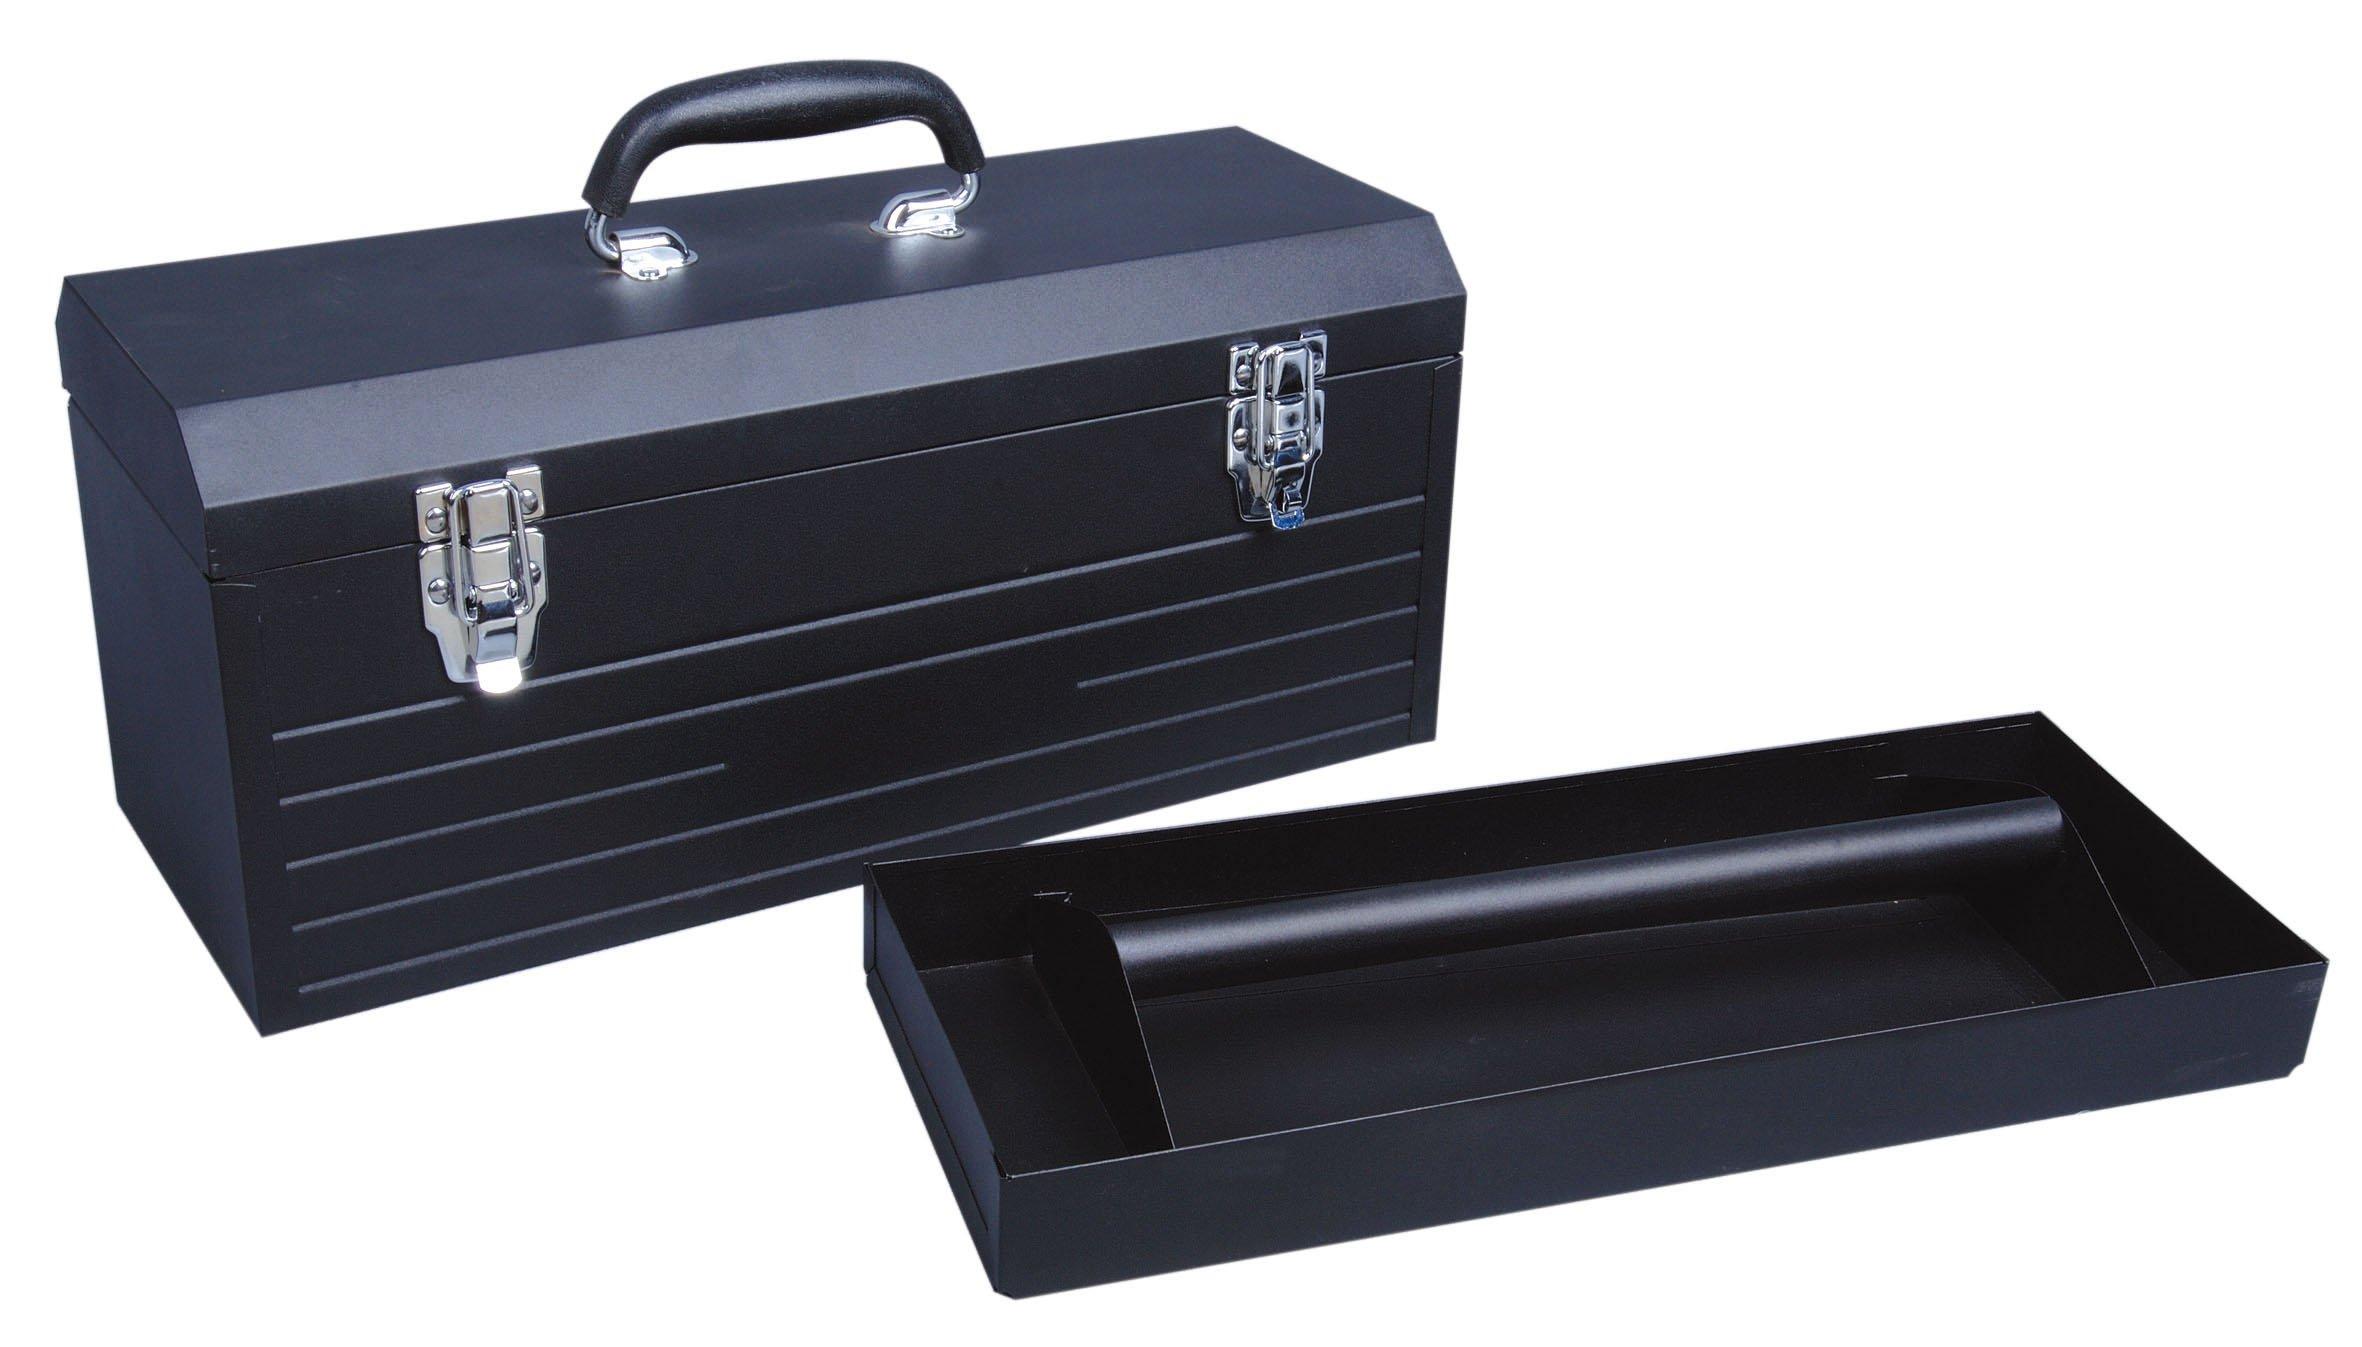 Tactix 321100 20-Inch Steel Tool Box, 51cm